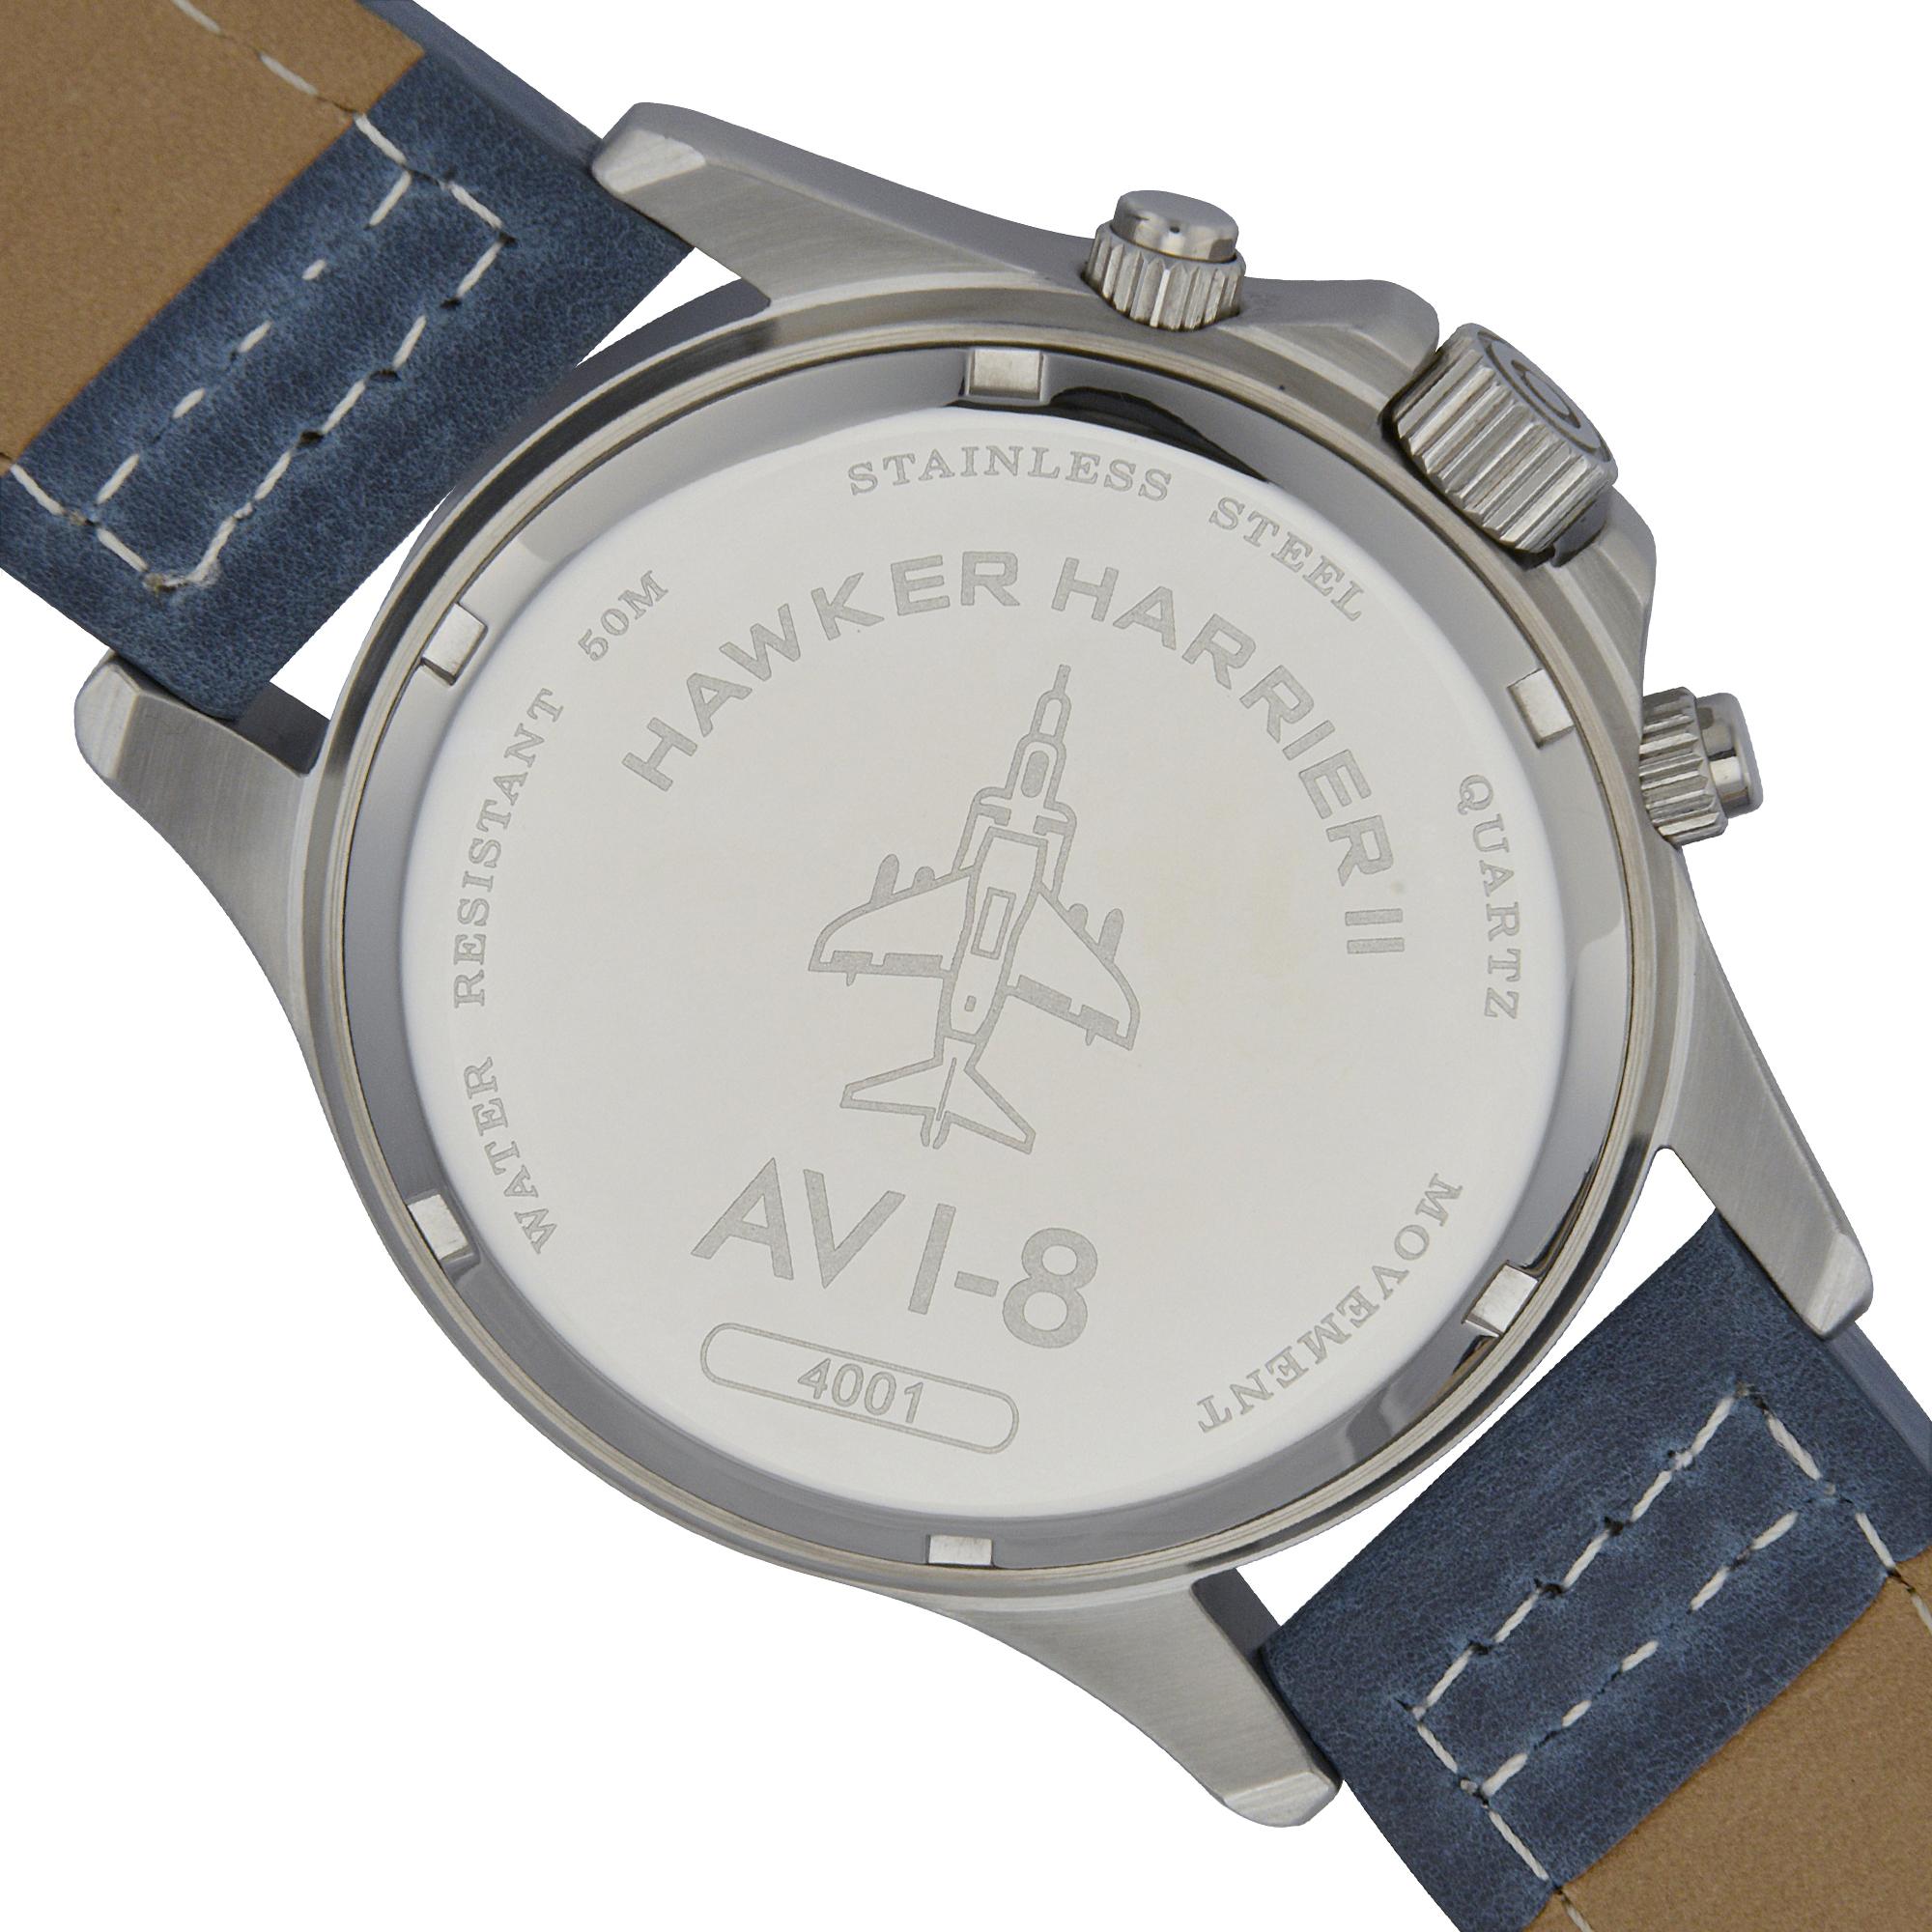 AV-4001-05